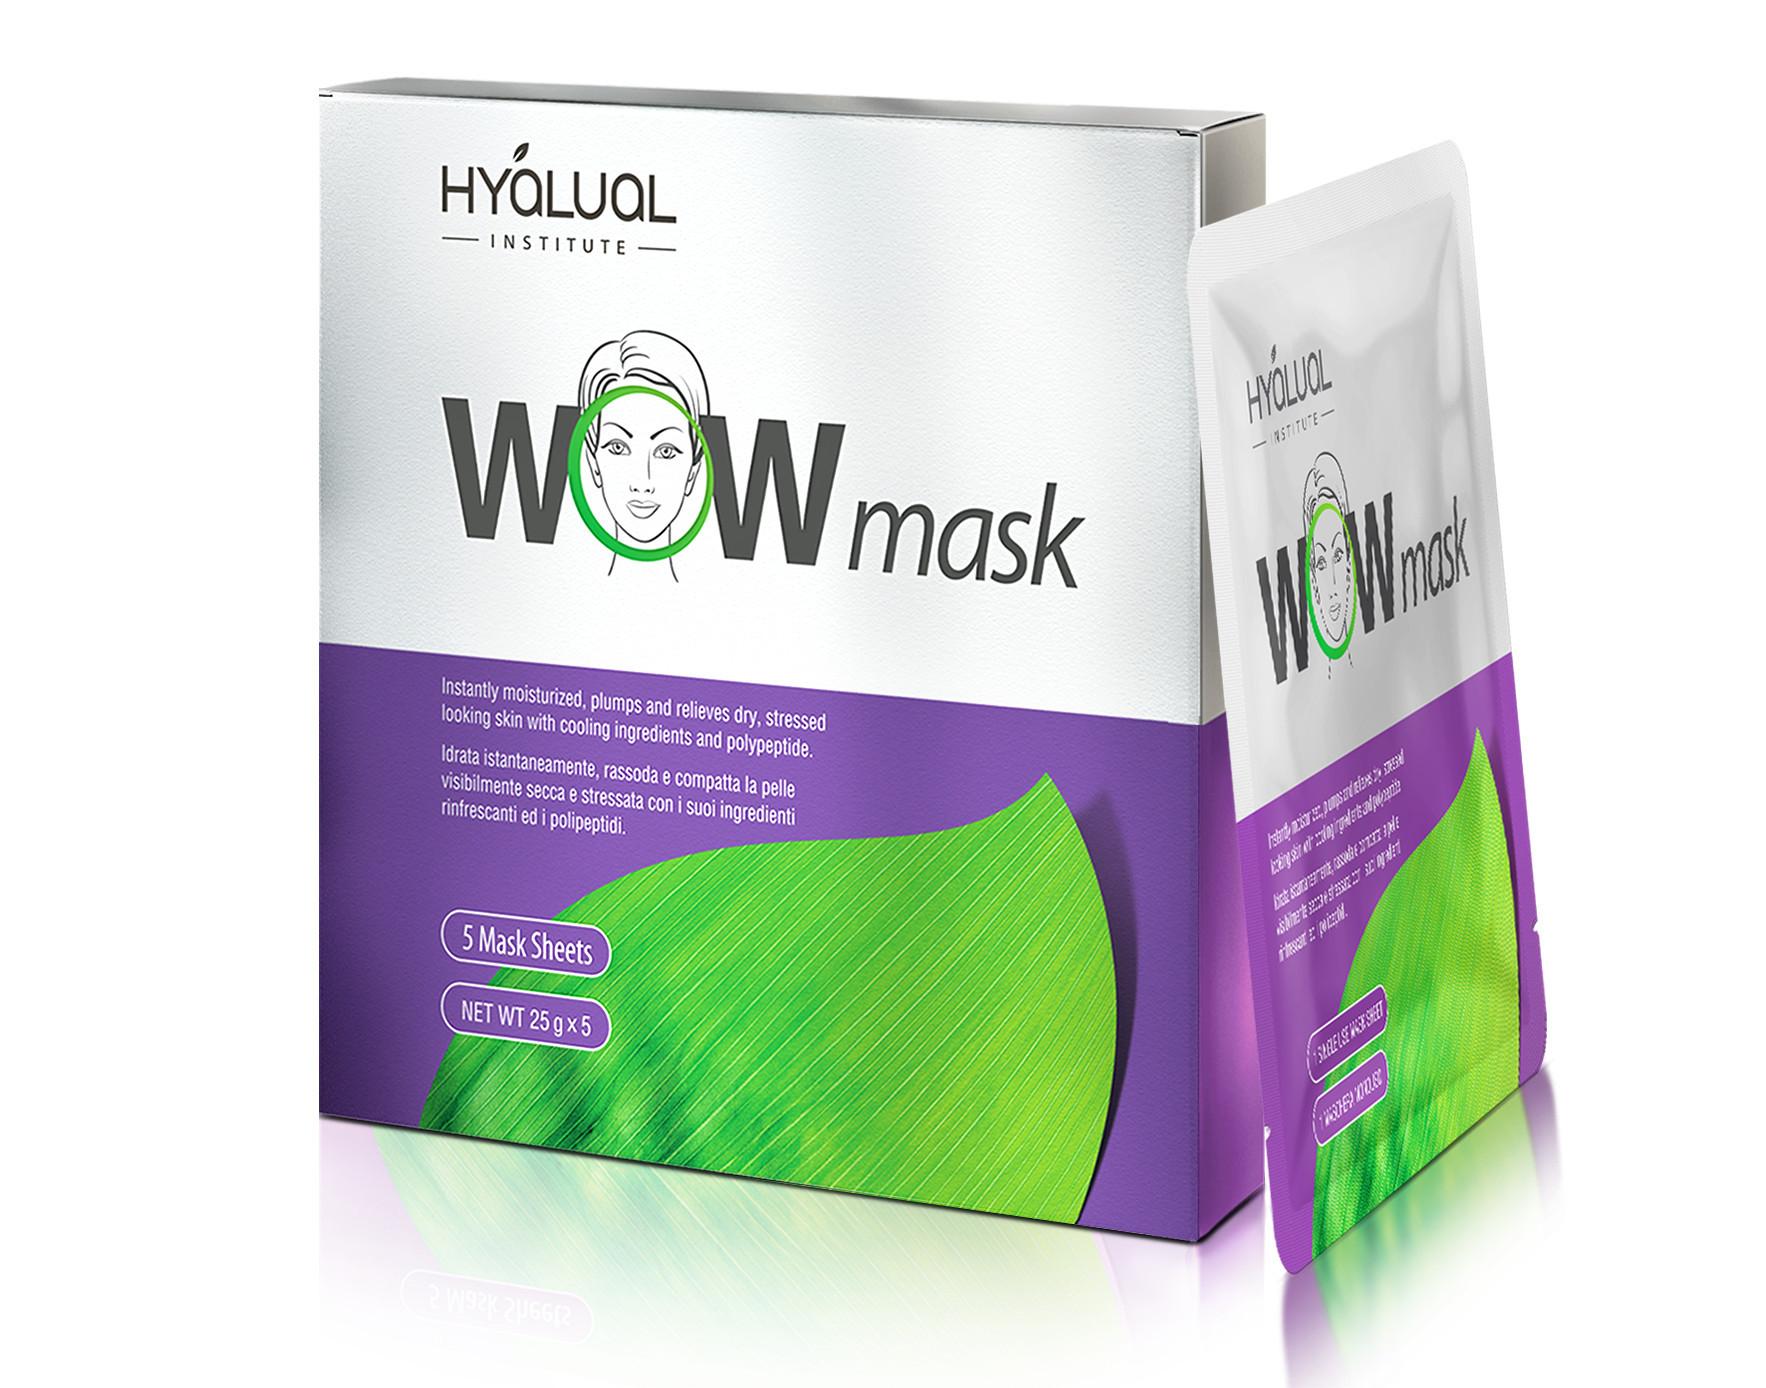 WOW mask Institute Hyalual